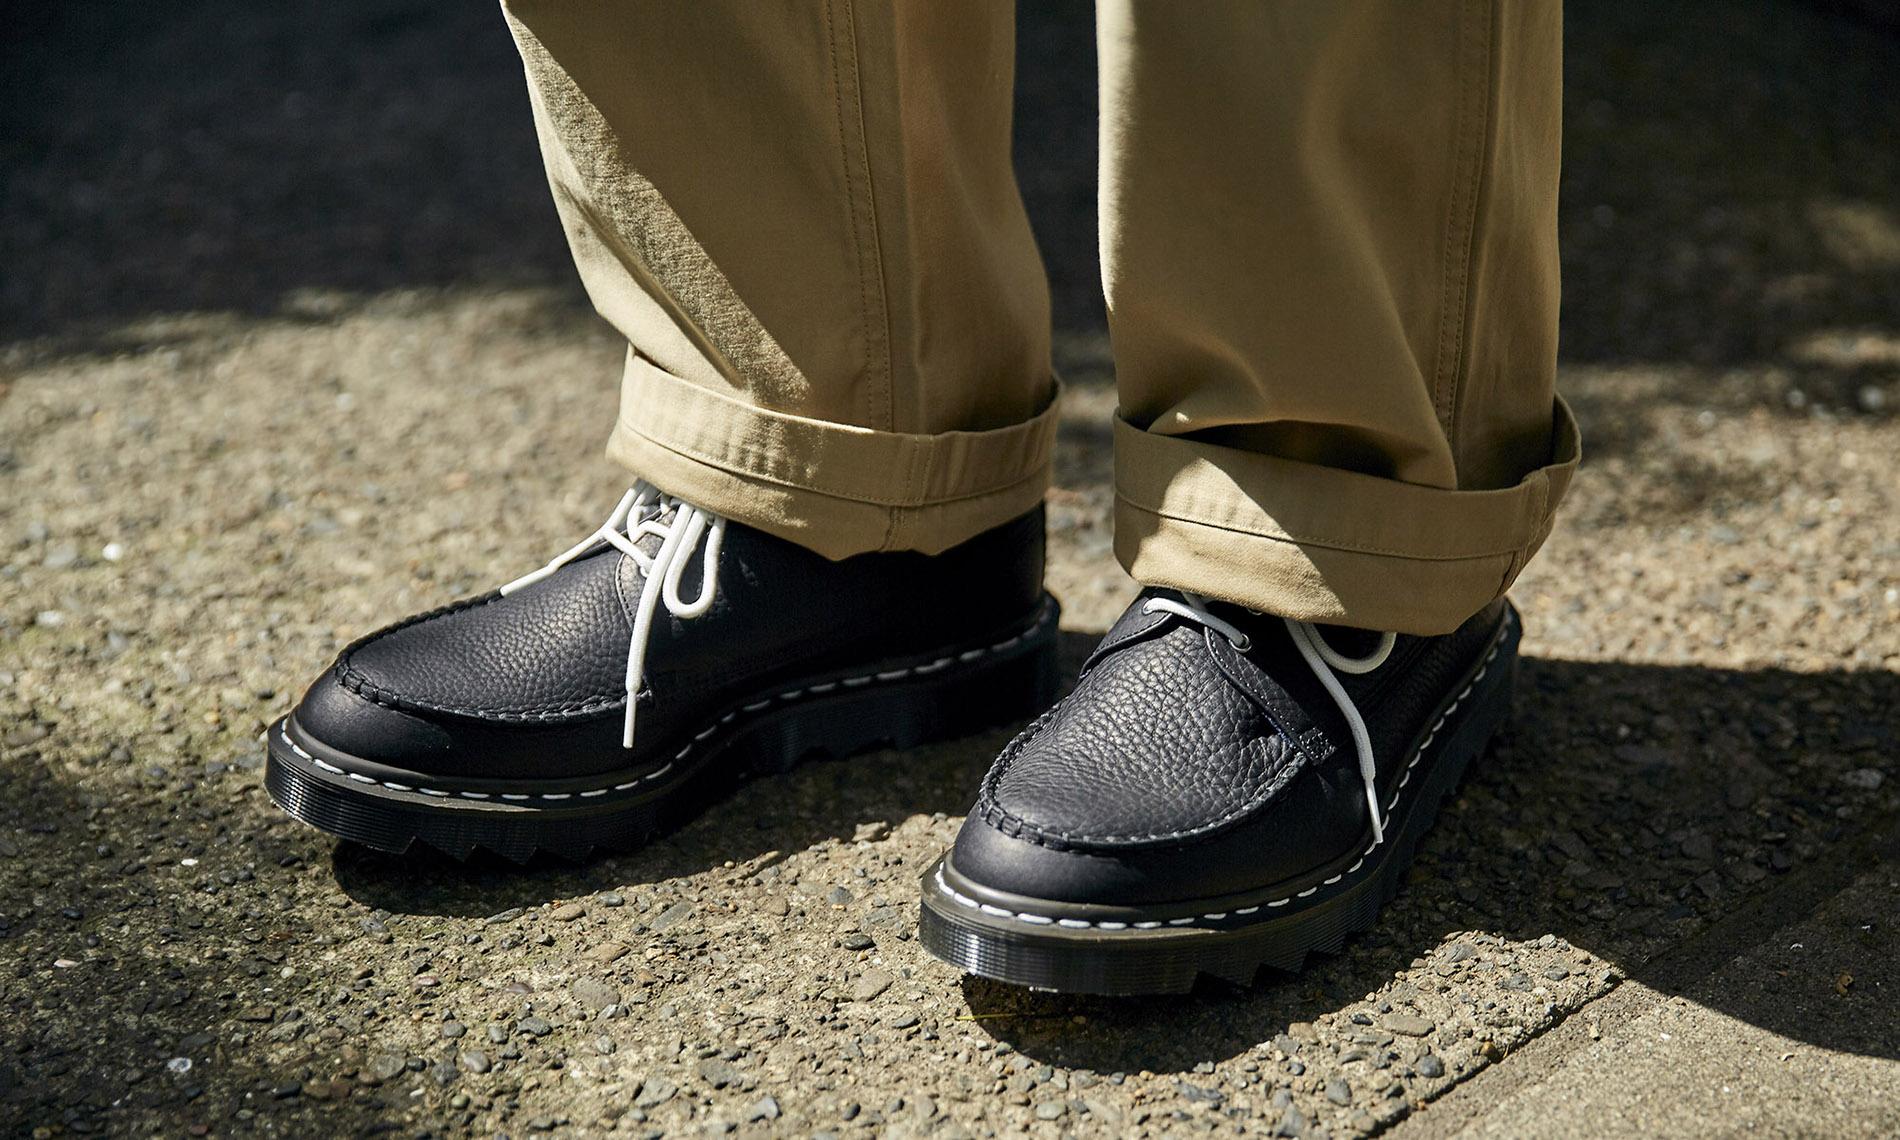 nanamica x Dr.Martens 联名鞋款释出